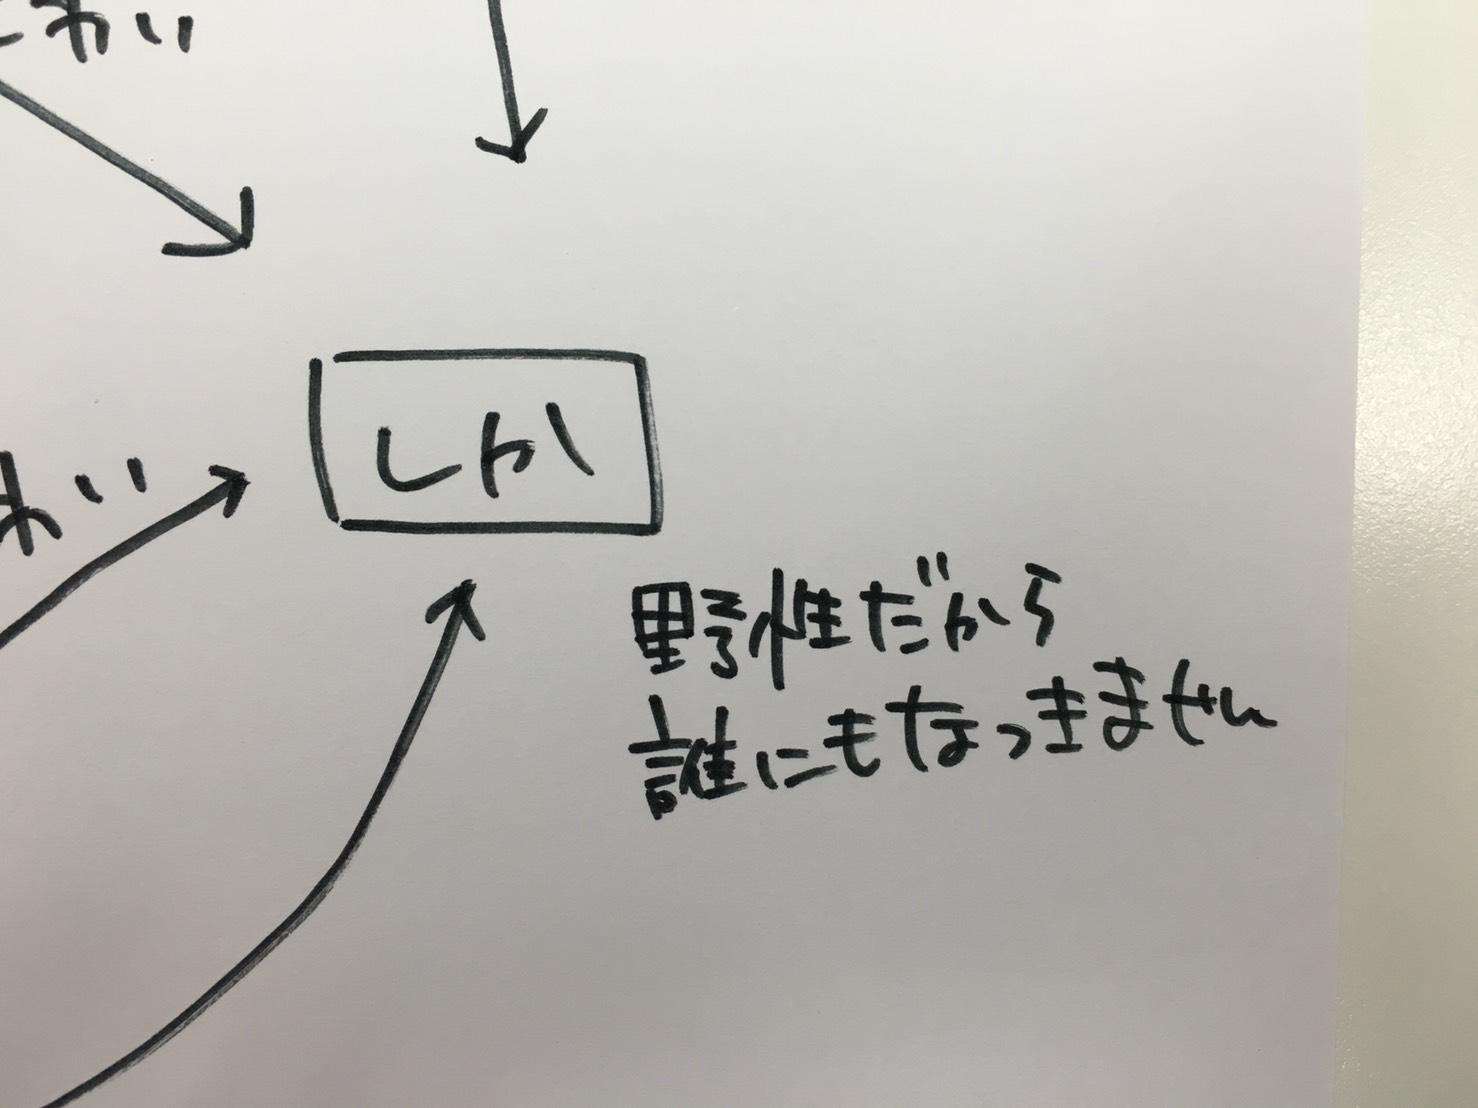 S__6864907.jpg